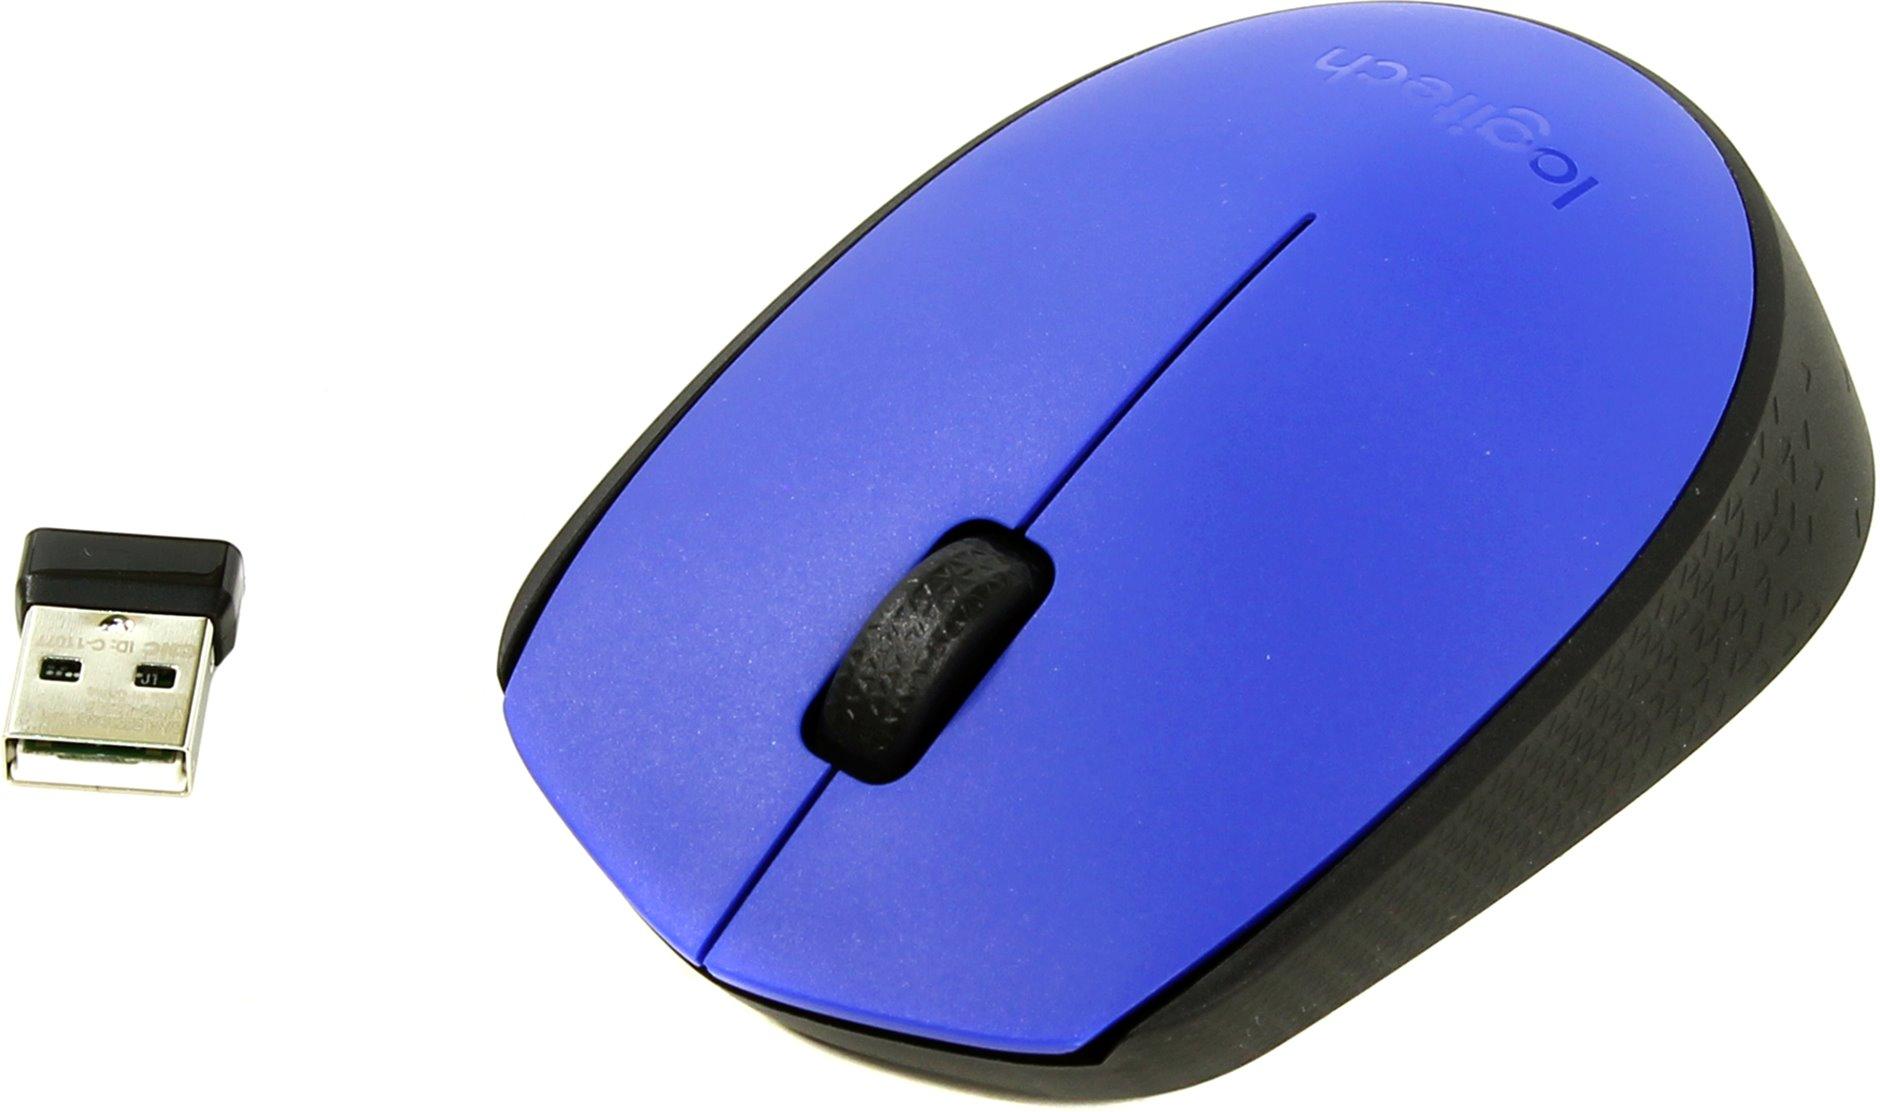 Logitech Mini M171